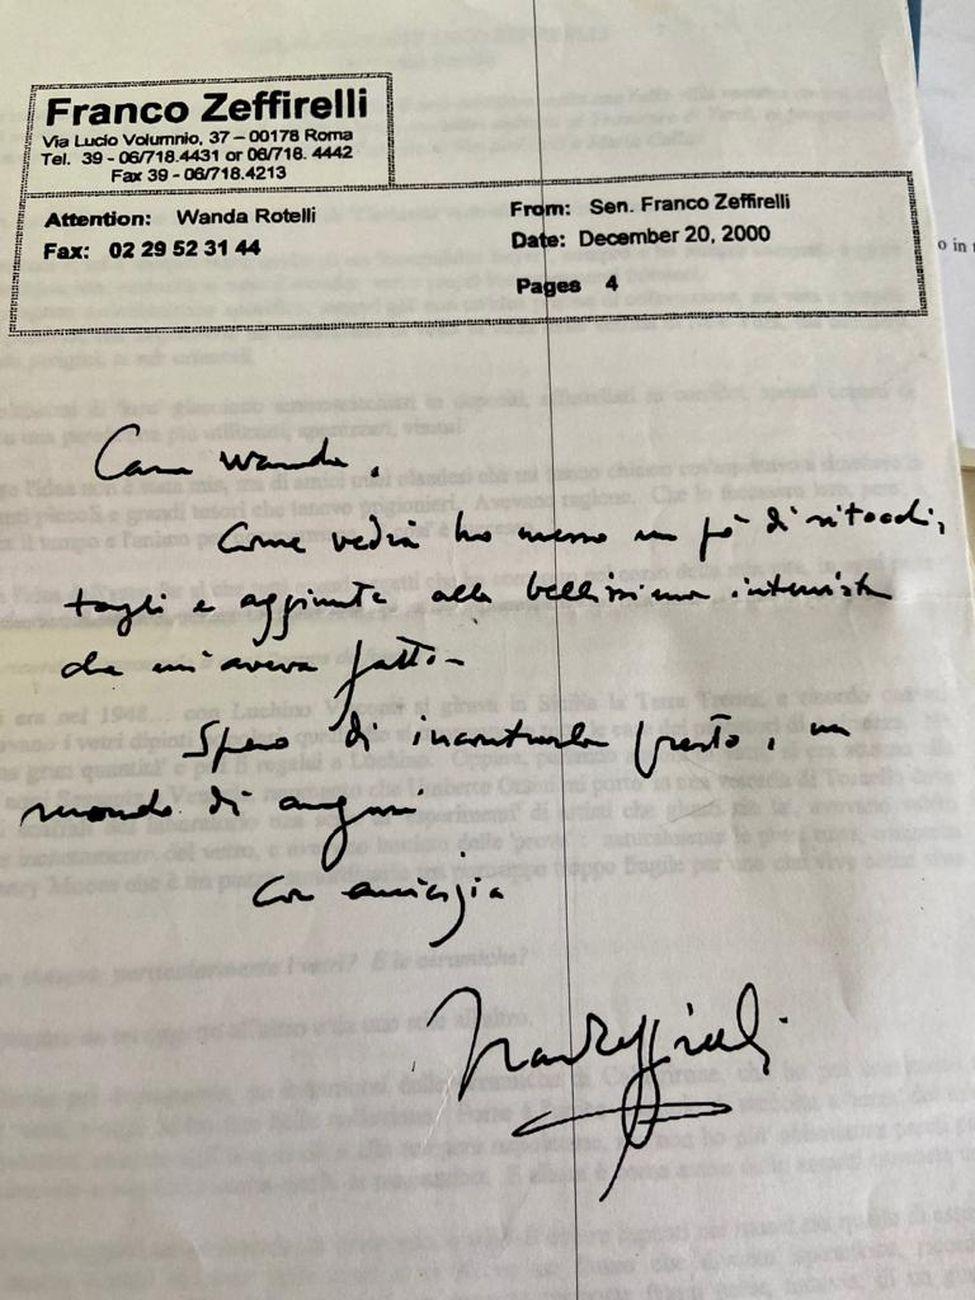 Fax di Franco Zeffirelli a Wanda Rotelli